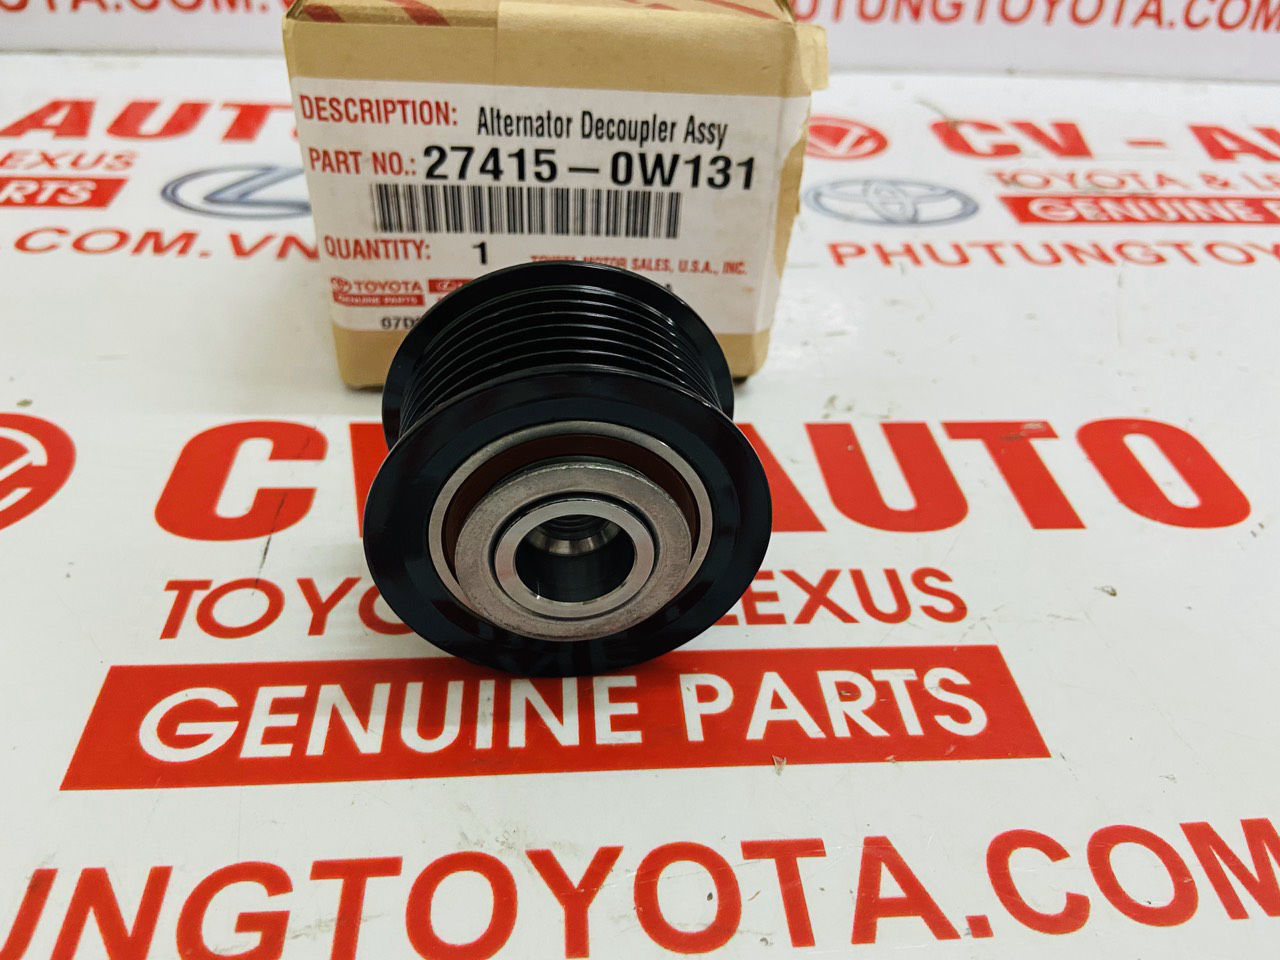 Picture of 27415-0W131, 27415-0W131 Pully máy phát Lexus RX330 RX350 ES350 IS250 IS350 GS300 GS350 Toyota Camry Venza Highlander RAV4 Sienna chính hãng